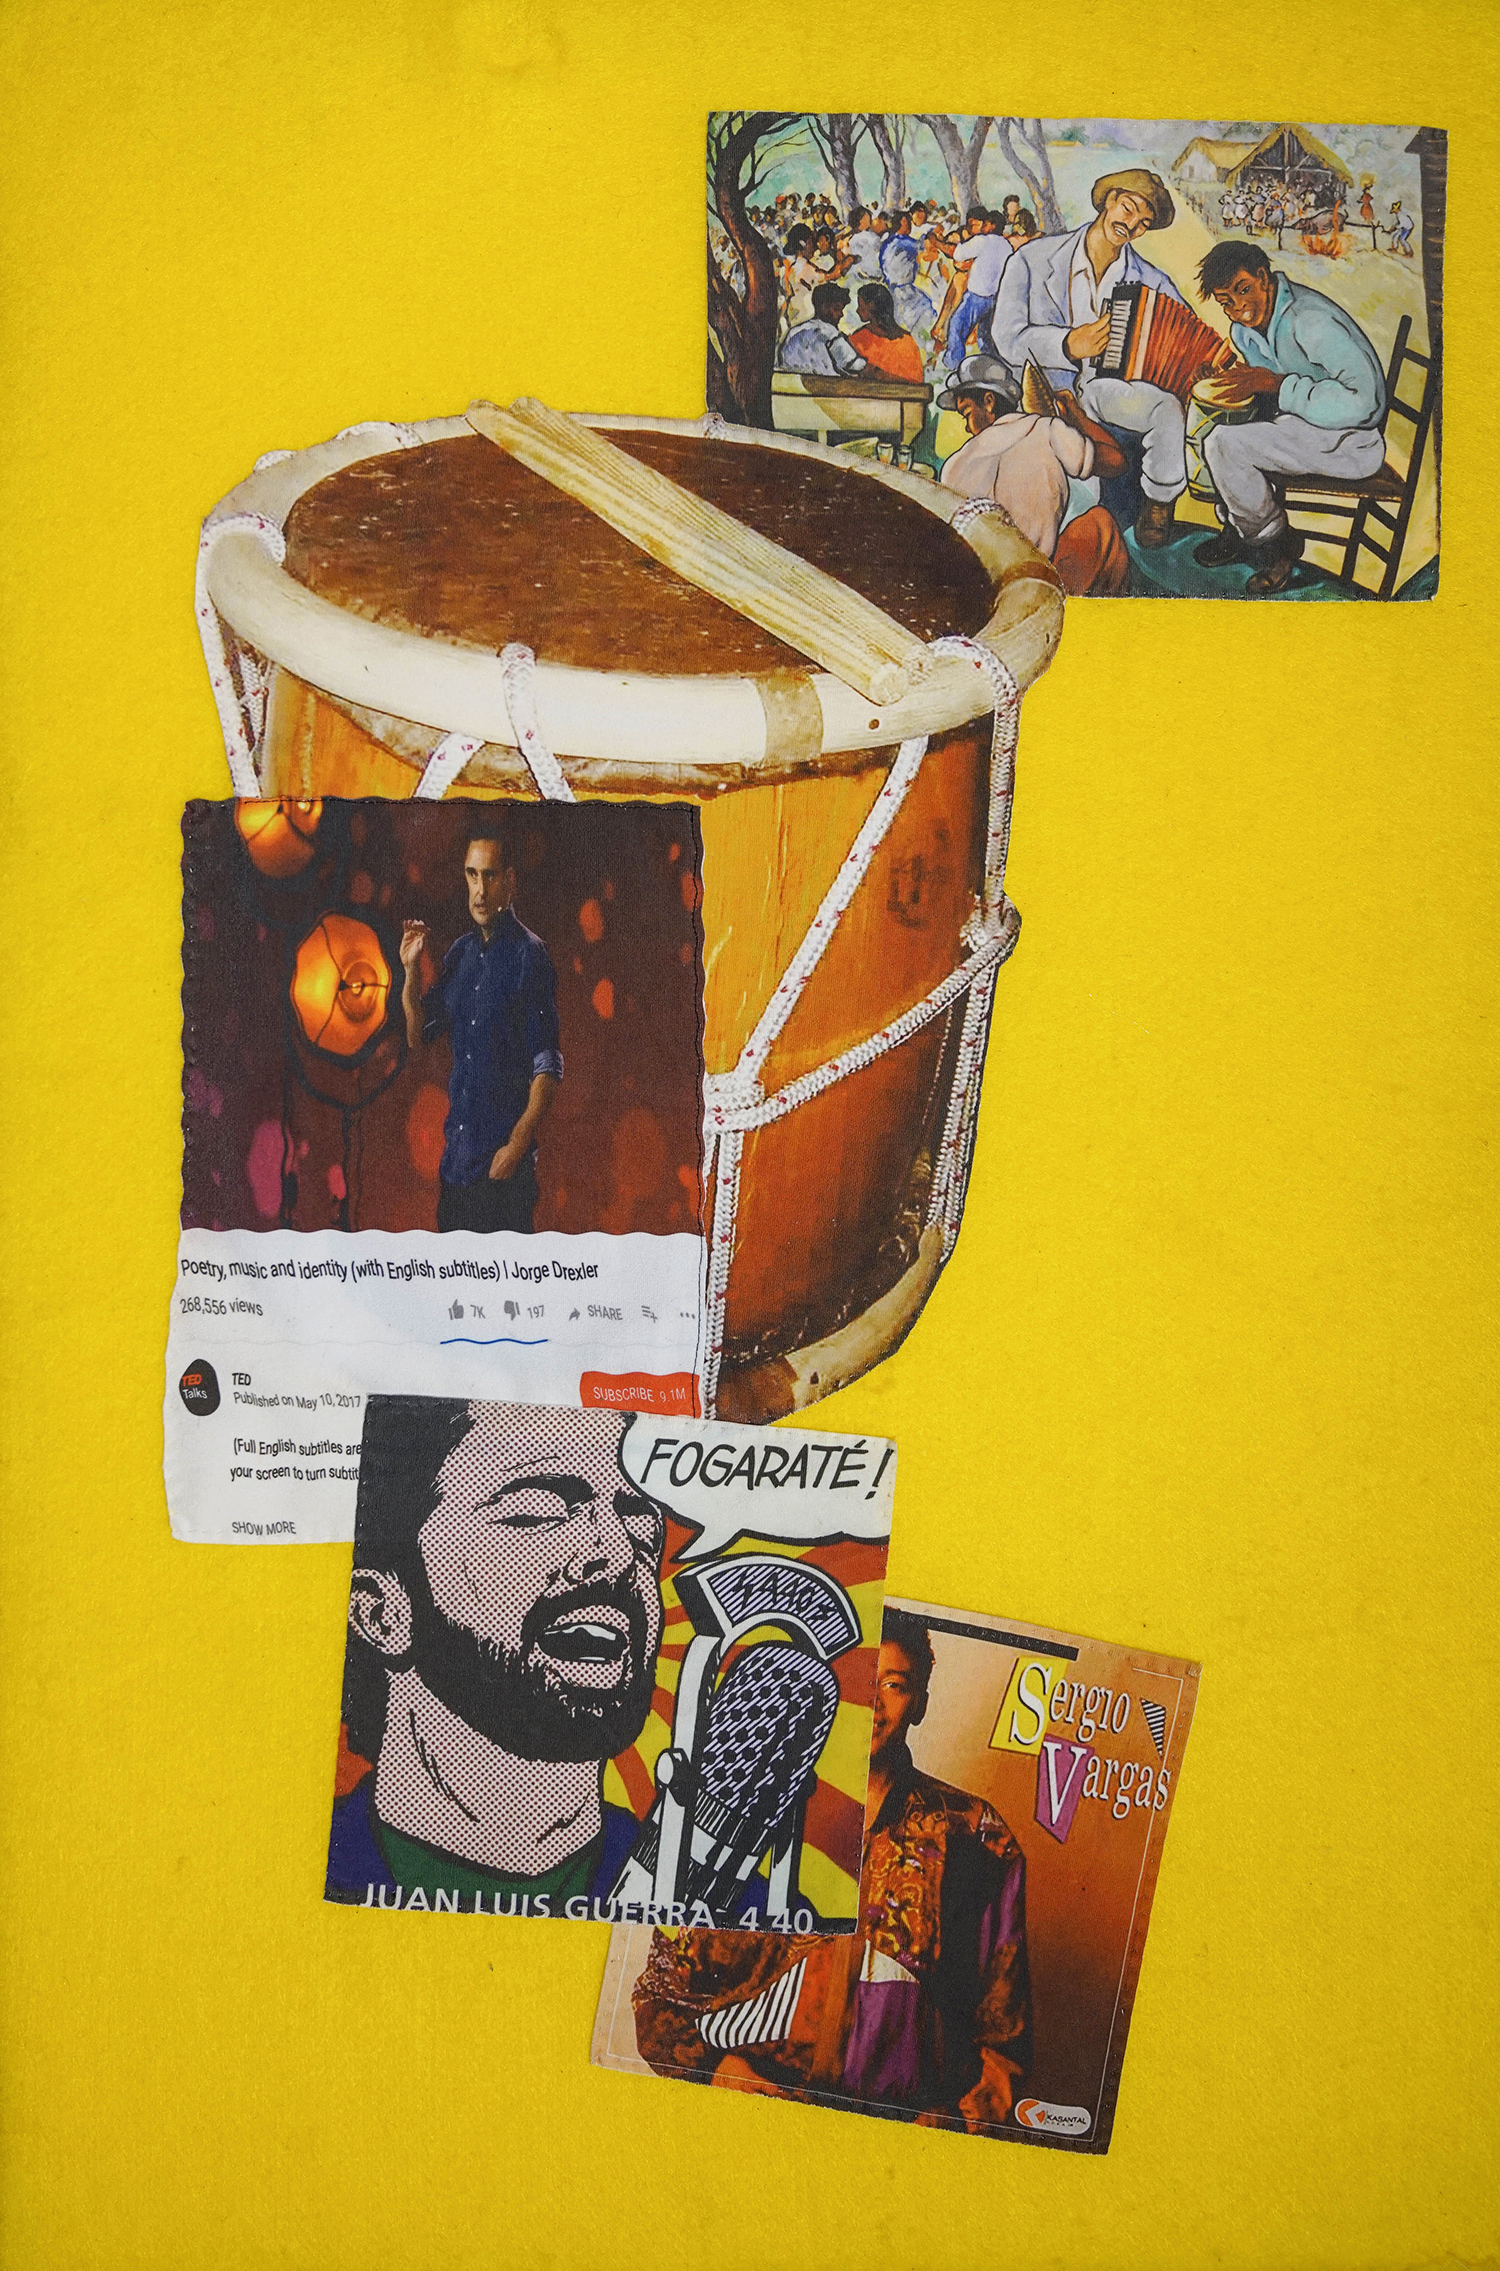 Poetry, Music & Identity   Digital printon fabric, felt, cotton & foam 24 x 36 in $8,000